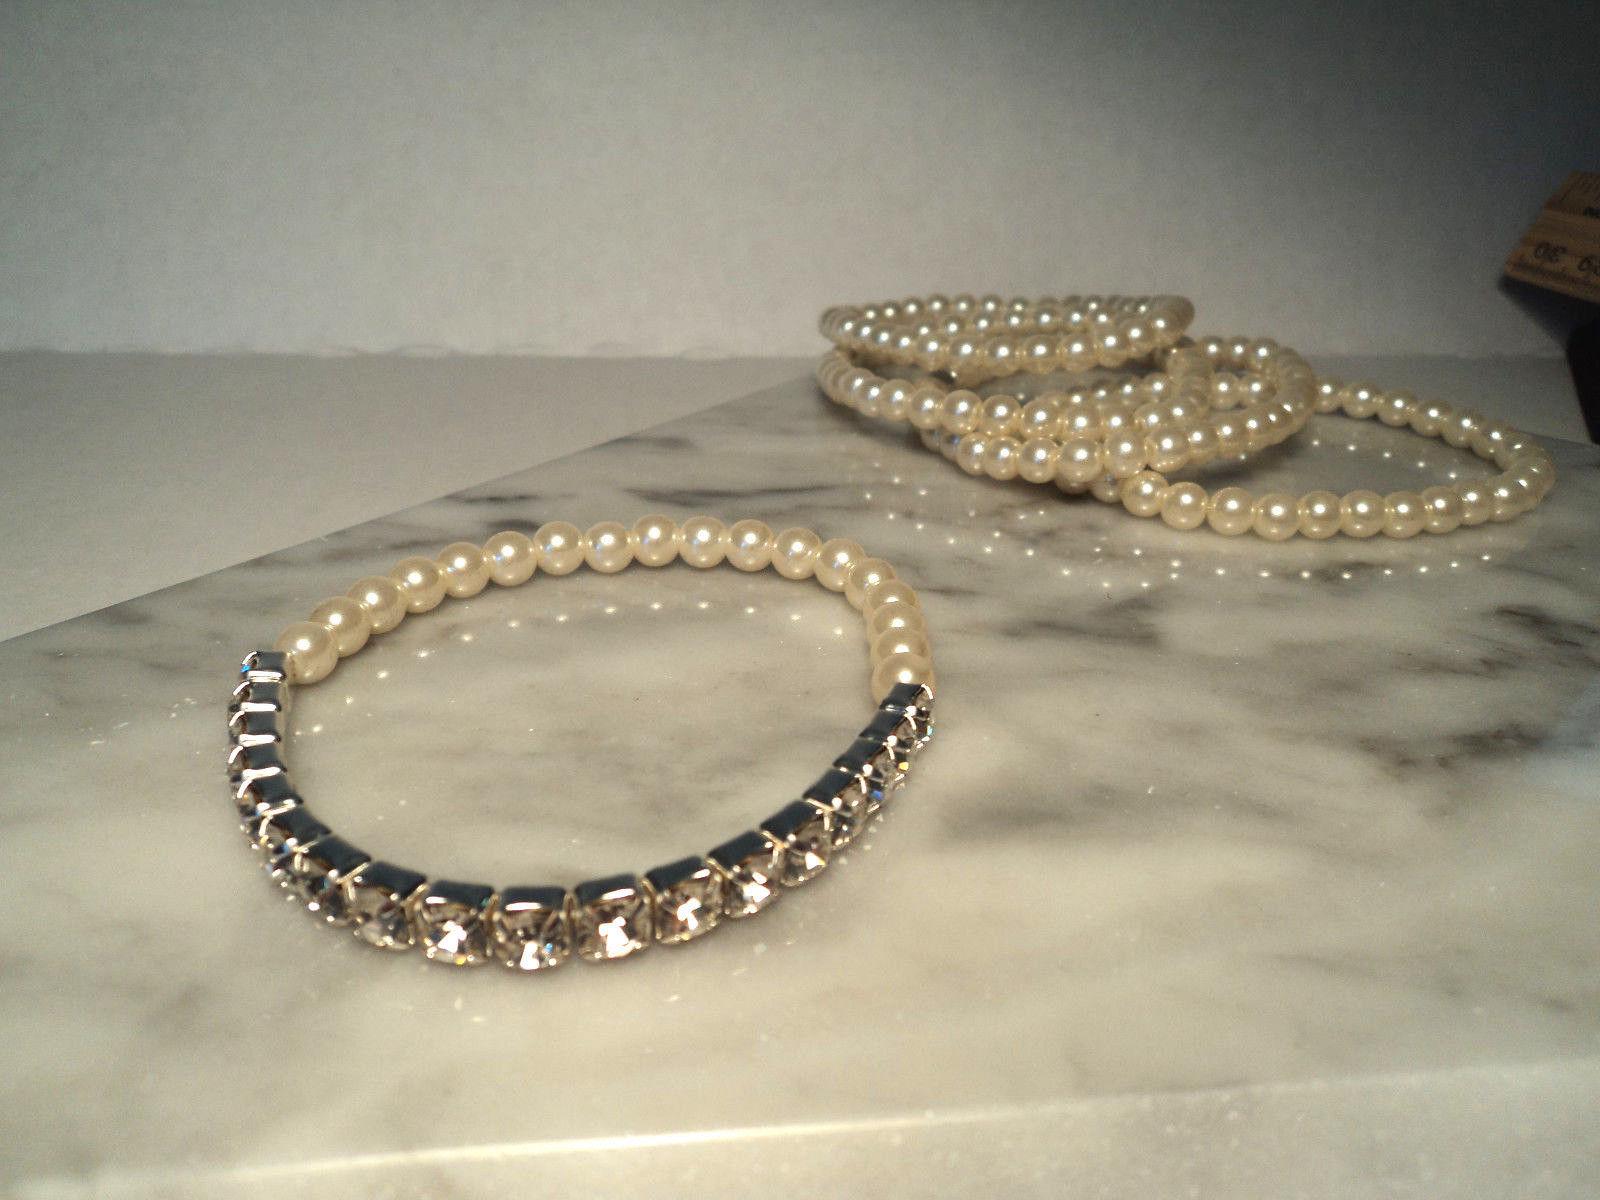 Avon Pretty Pearlesque and Rhinestone Stretch Bracelet Set New 2011 image 3